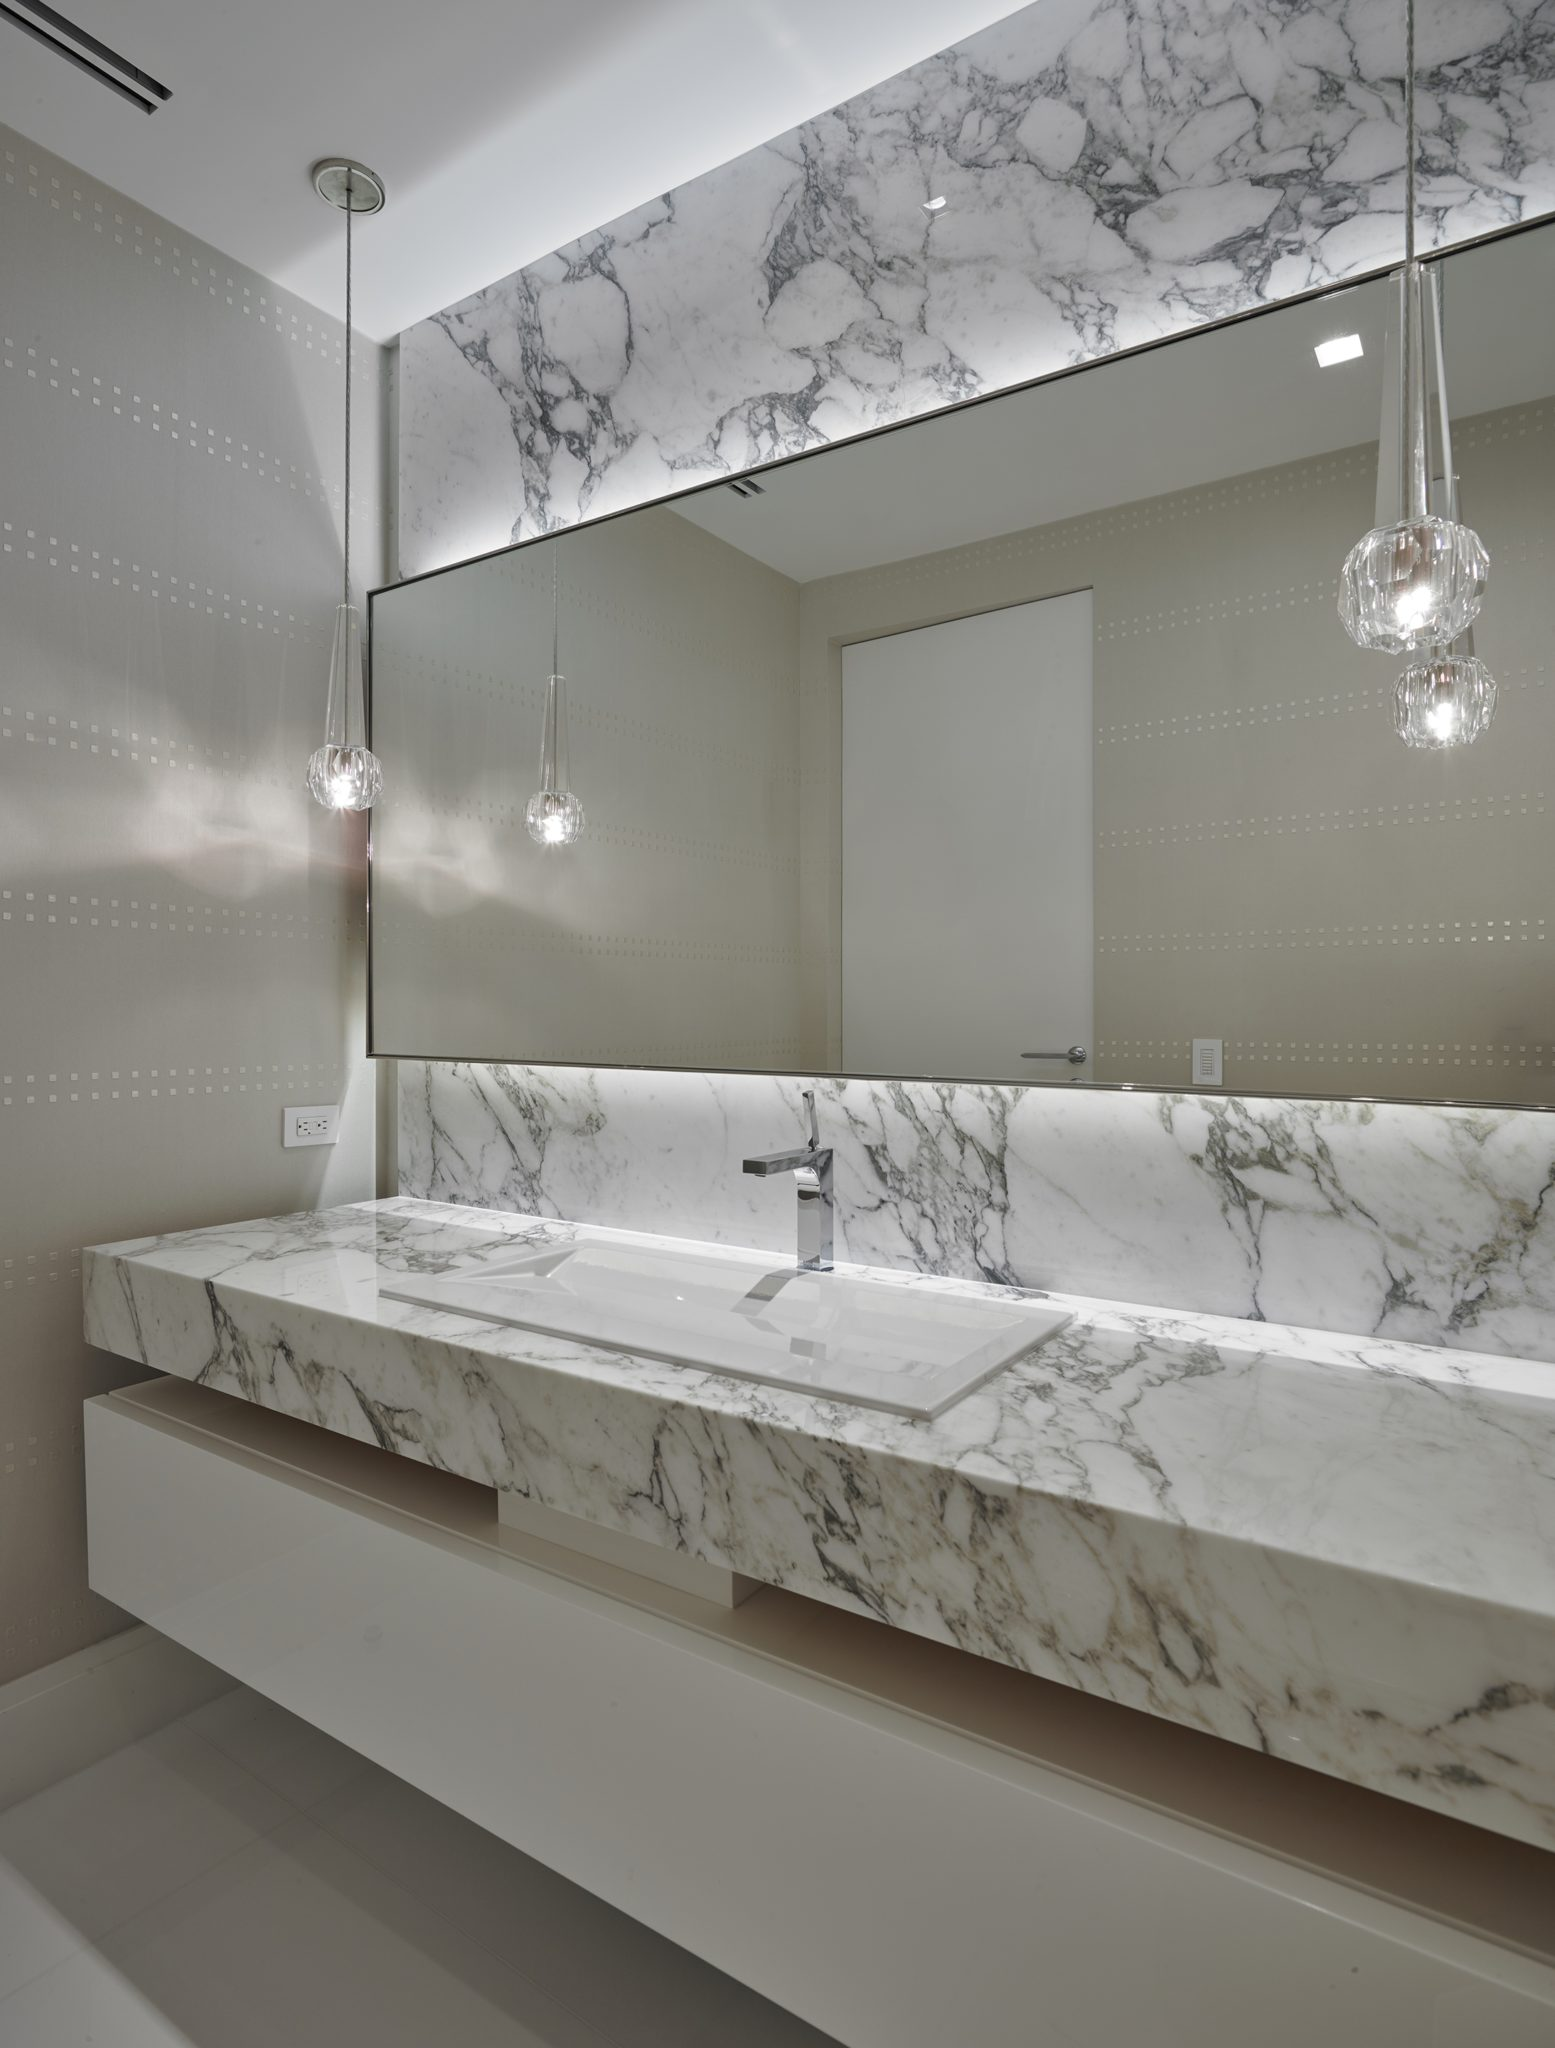 Metropolitan Residence White Powder Room by B+G Design